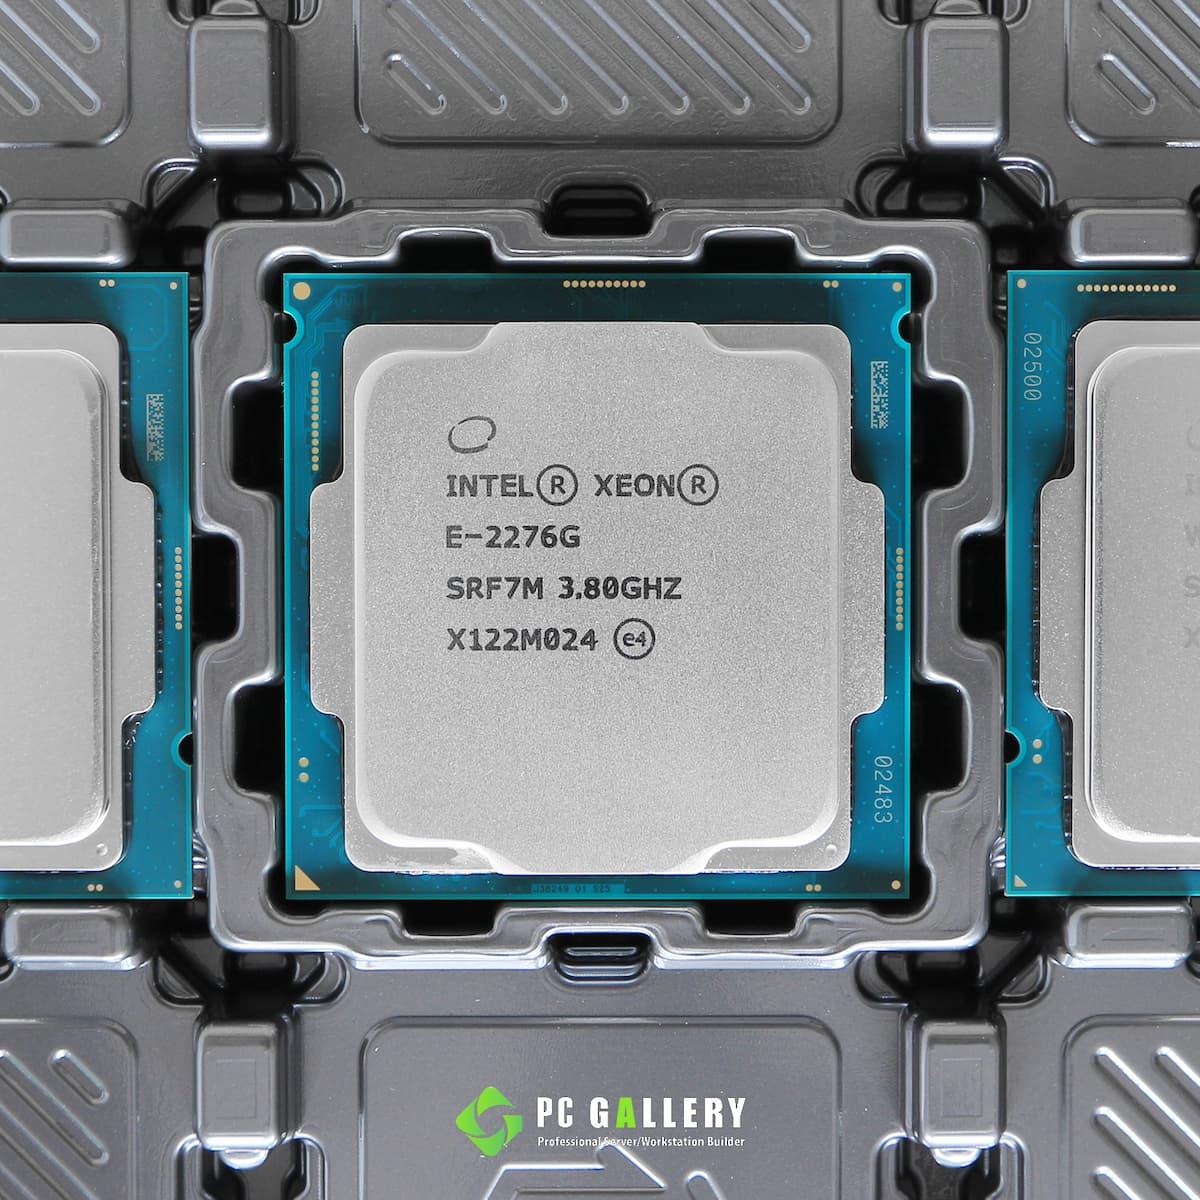 Intel-Xeon-E-2276G (Tray)